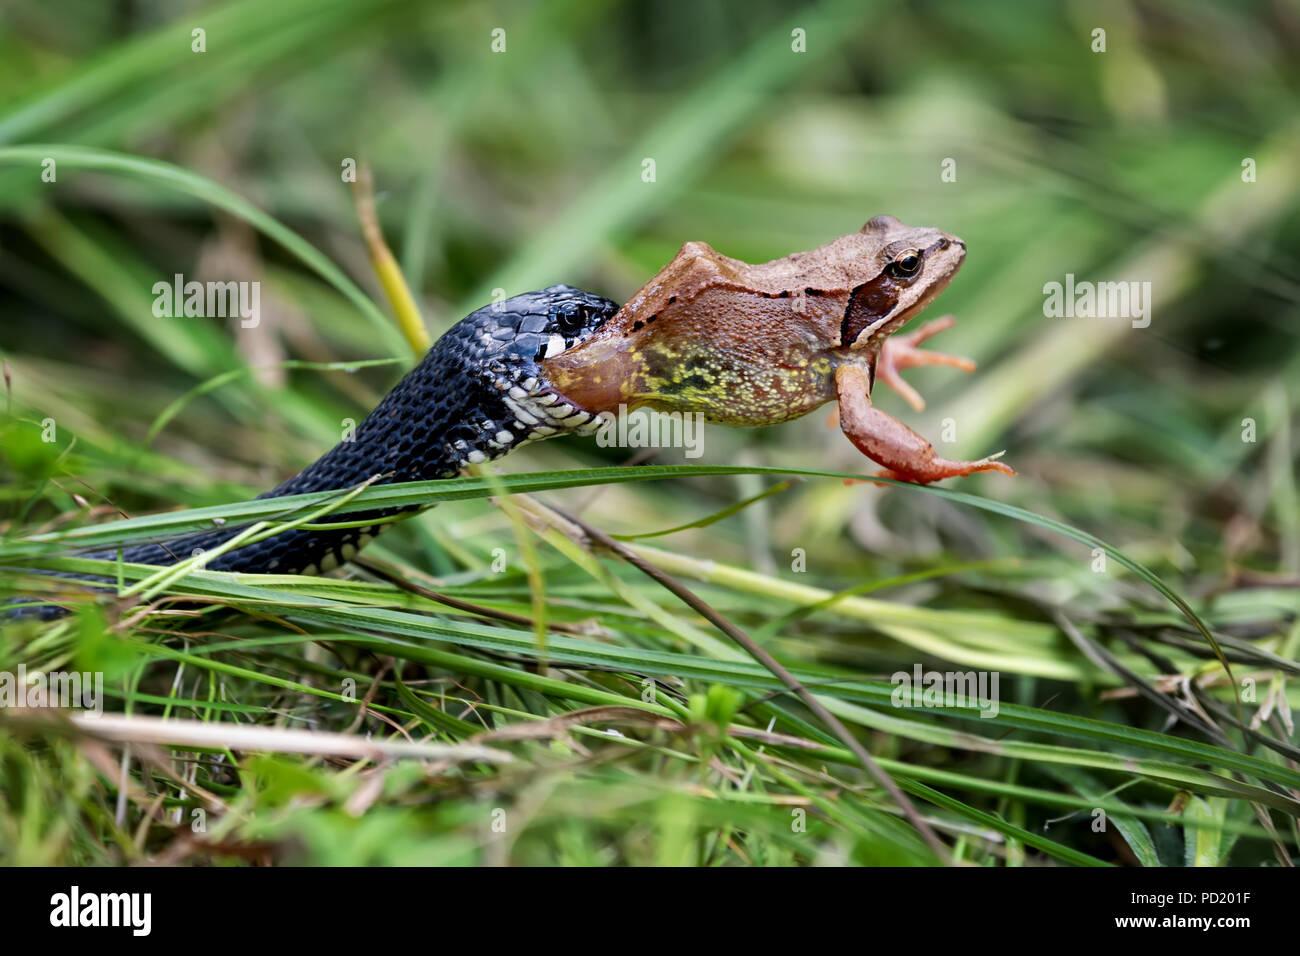 Black Snake eating big frog Photo Stock